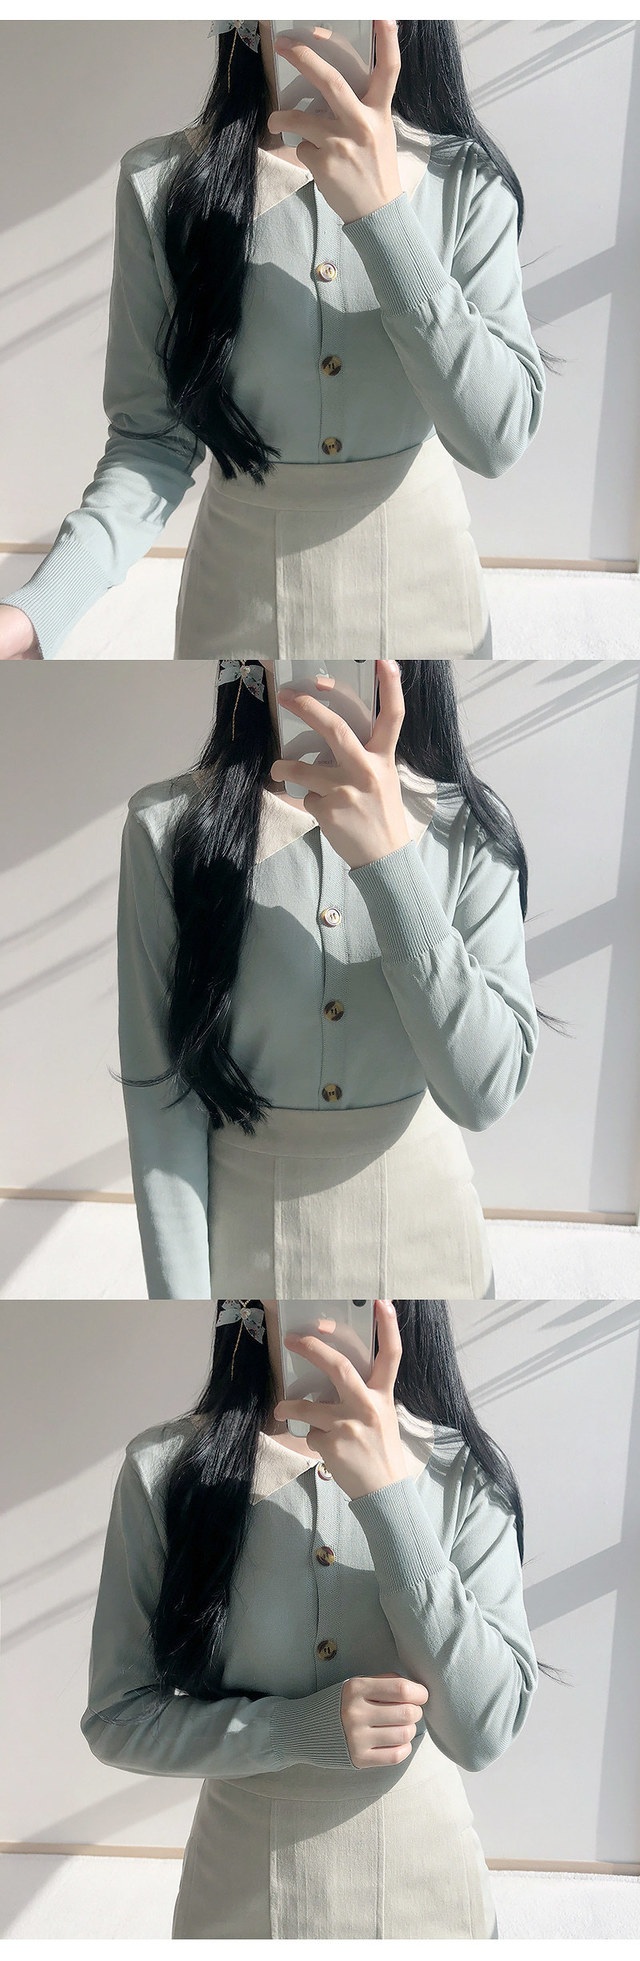 Melody Karanite